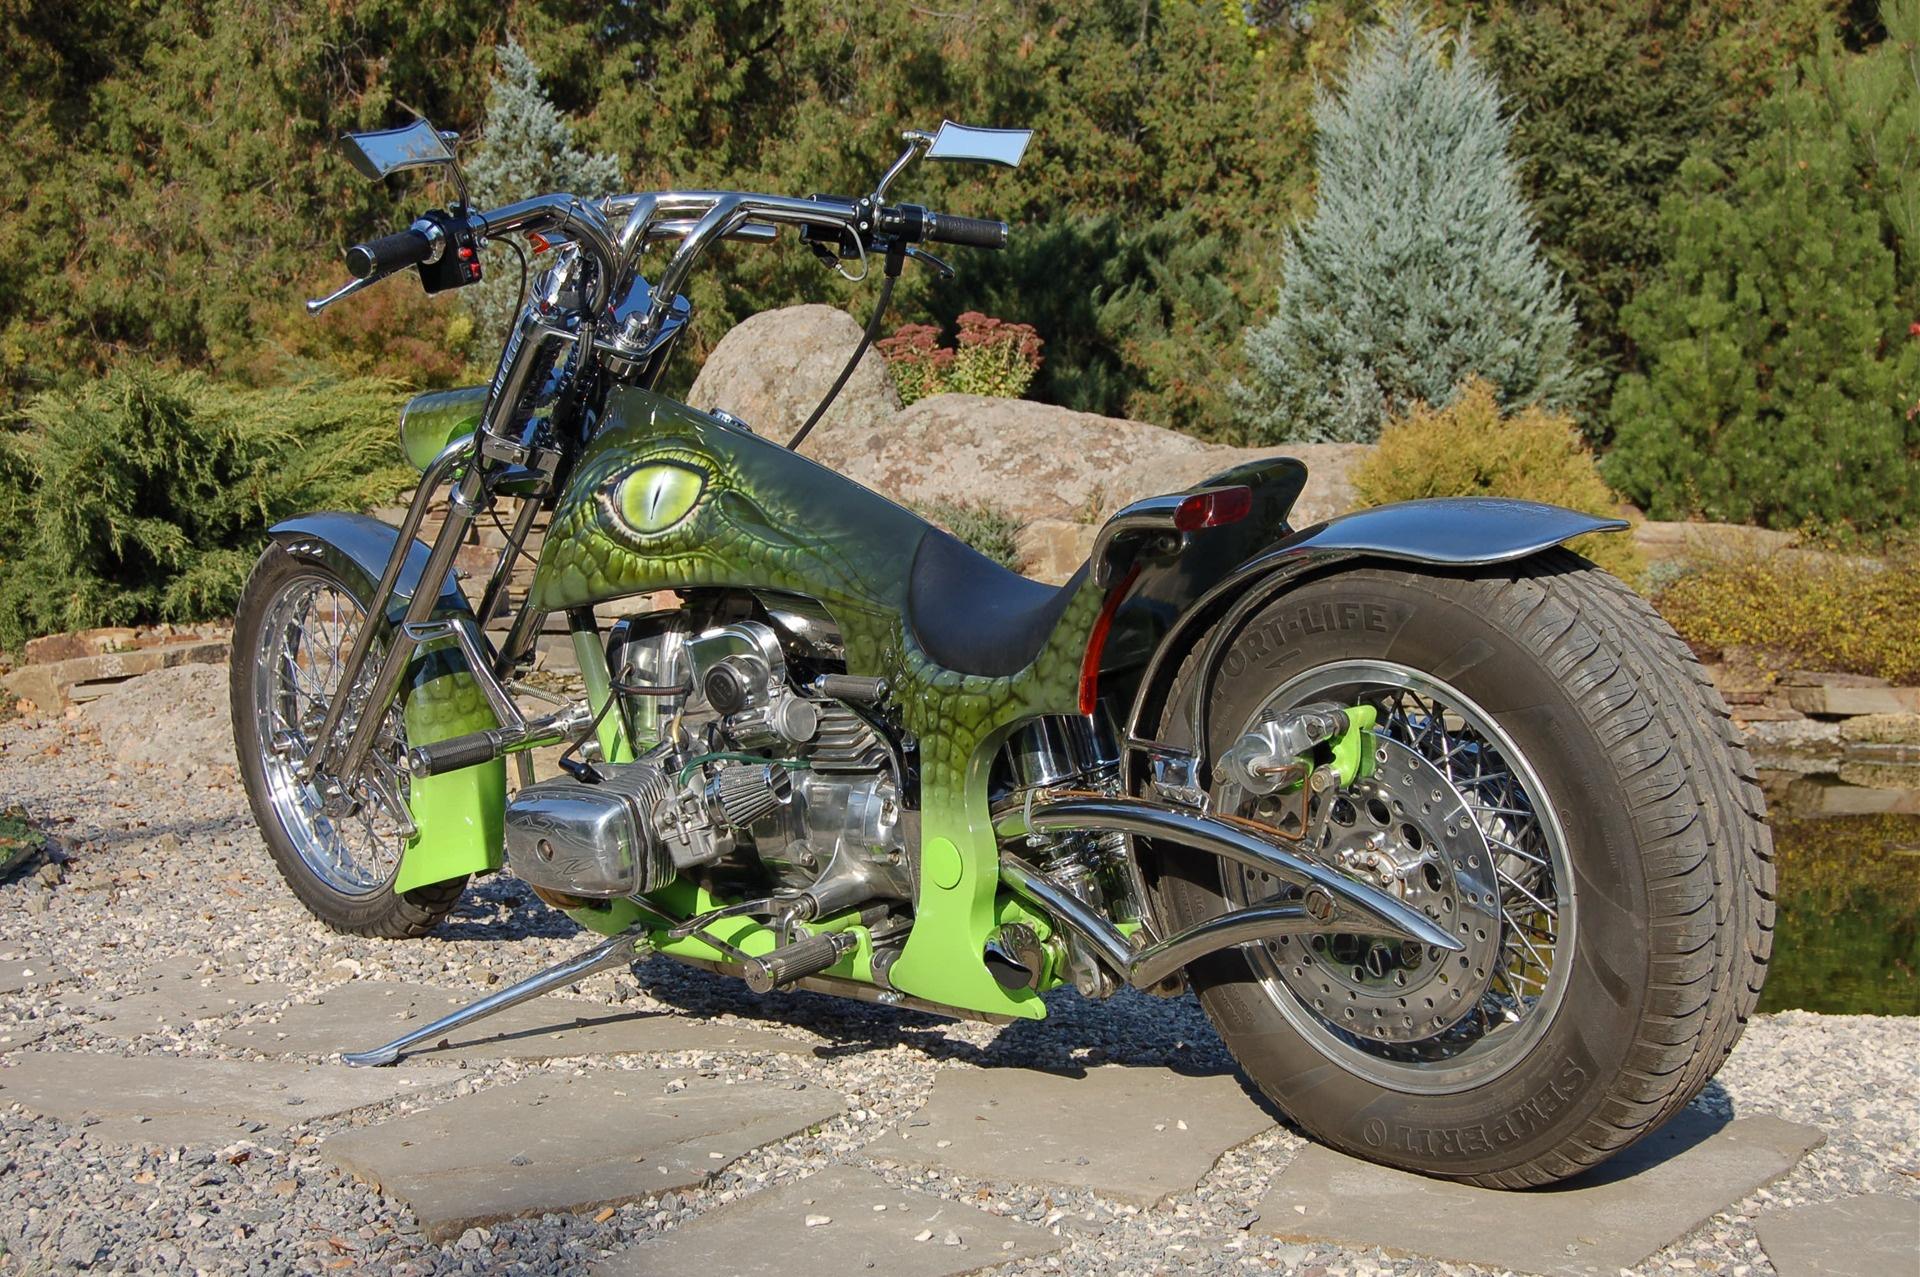 днепр мотоцикл тюнинг фото уже сданы эксплуатацию